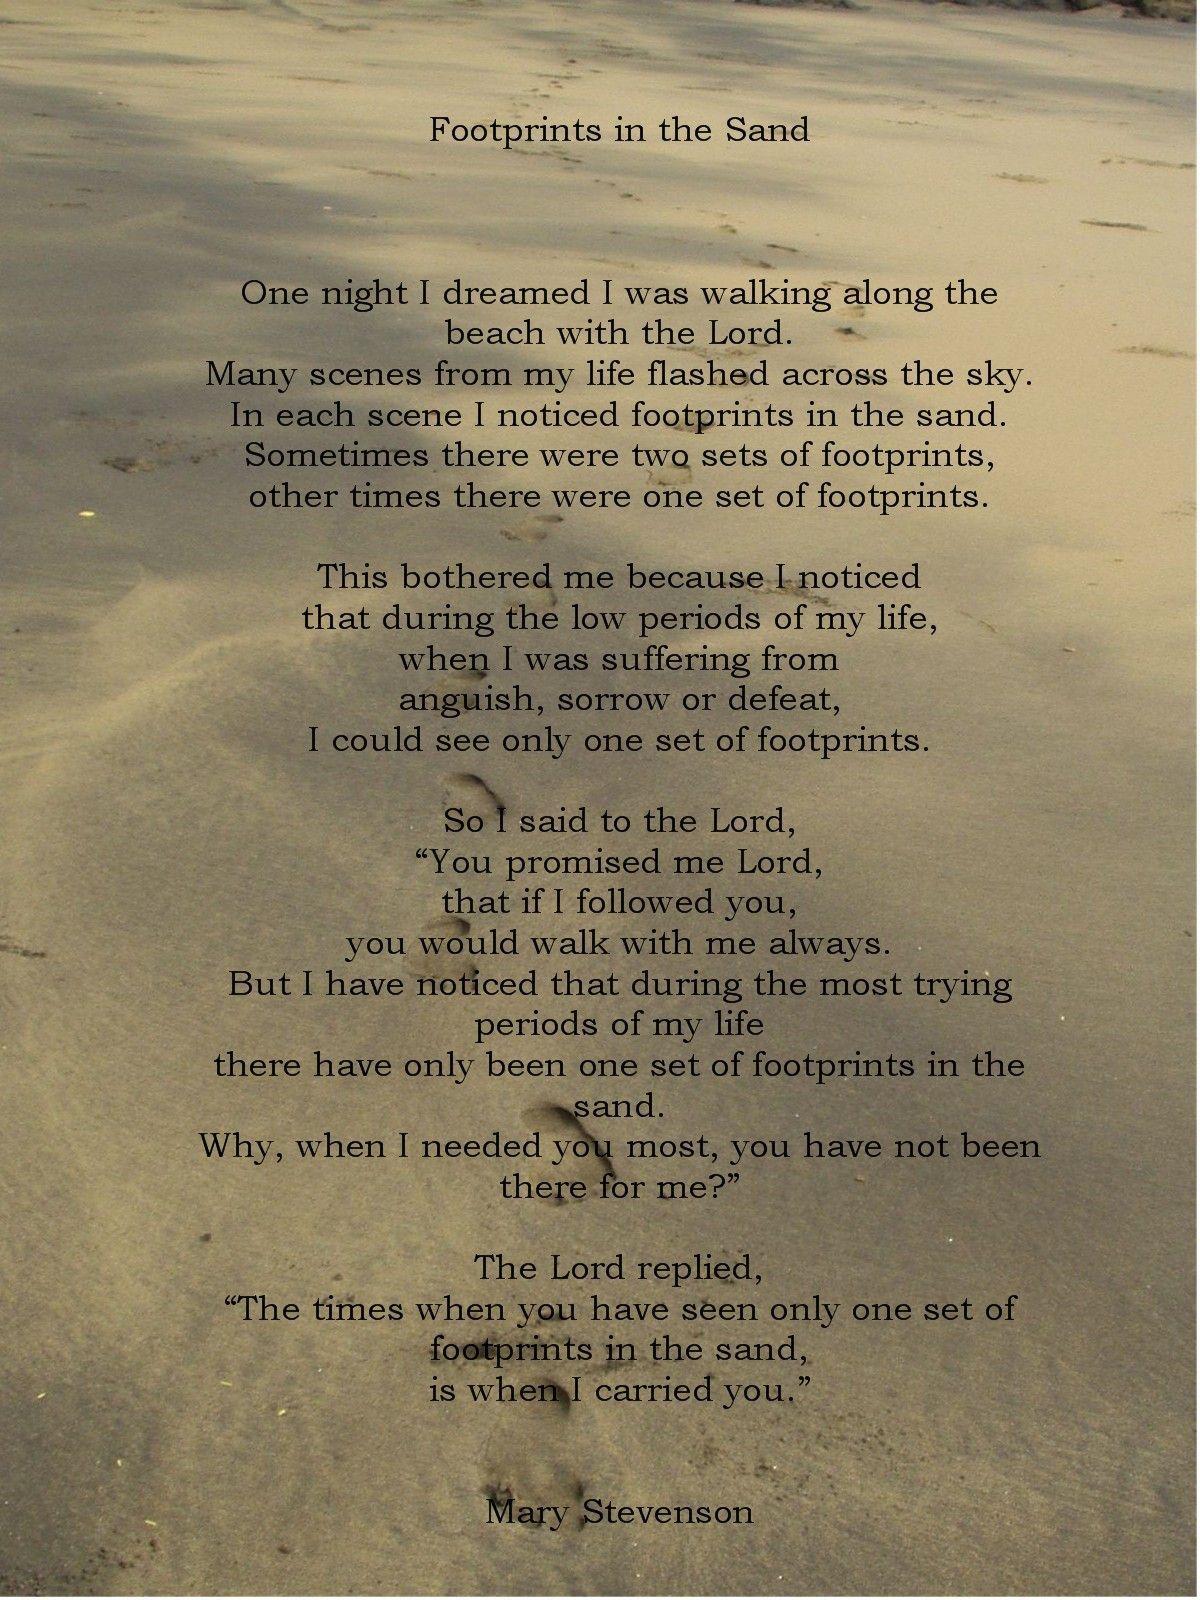 Footprints In The Sand (poem) - Wallpaper Hd | ΑΠΟΦΘΕΓΜΑΤΑ ...